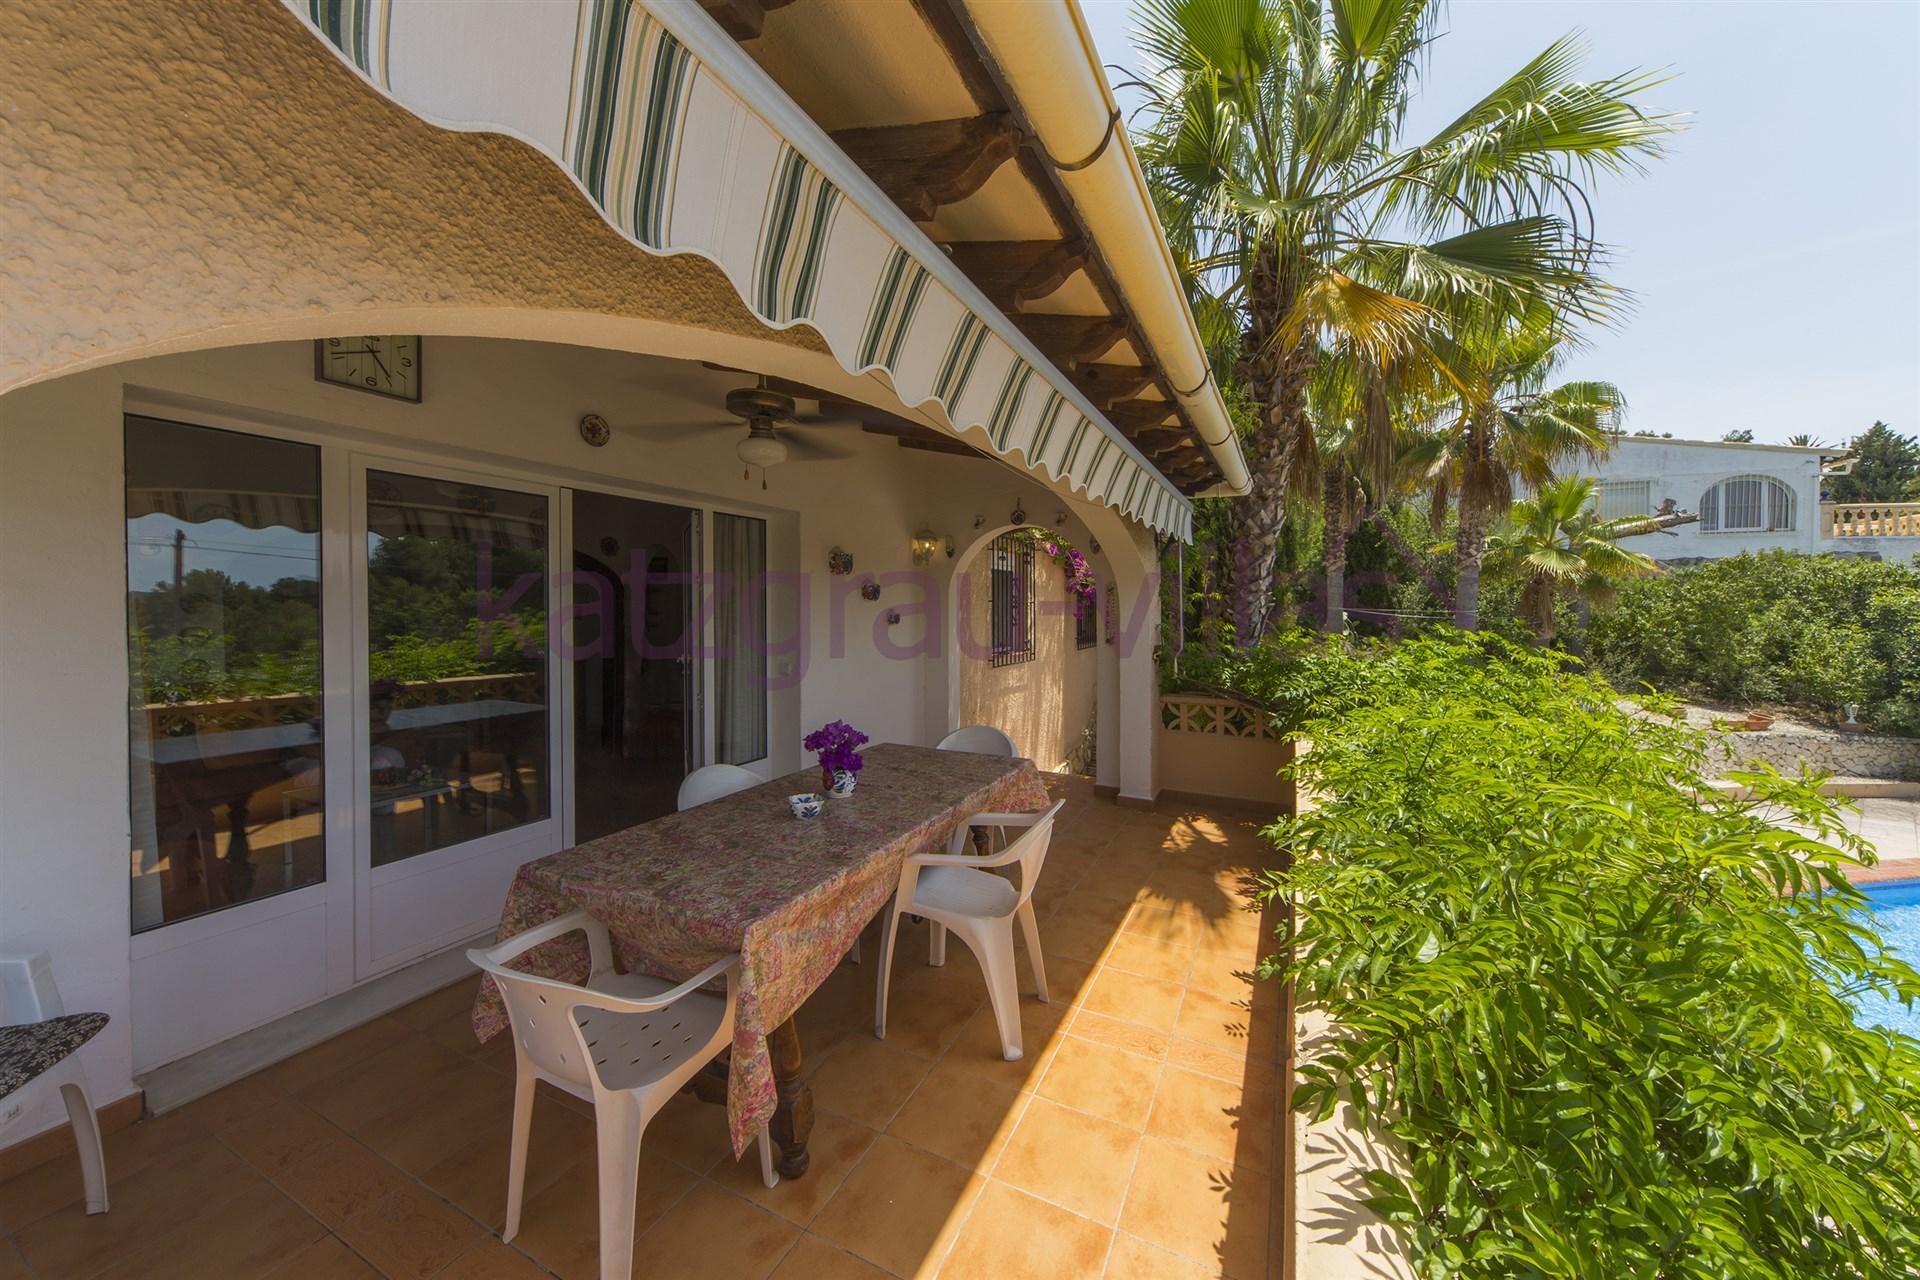 Villa en alquiler en moraira alicante casa tapies - Alquiler apartamentos costa blanca ...